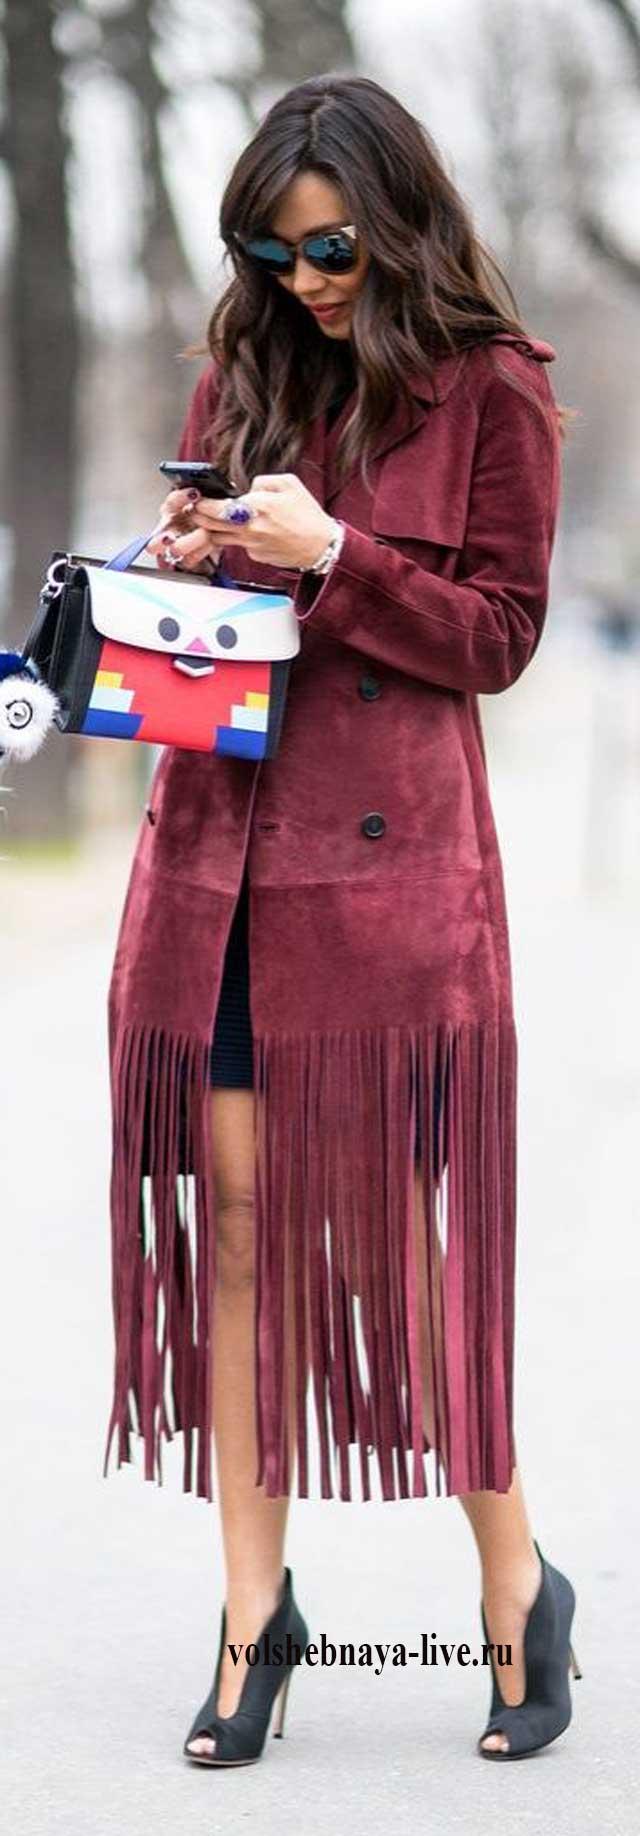 Пальто из замши с бахромой